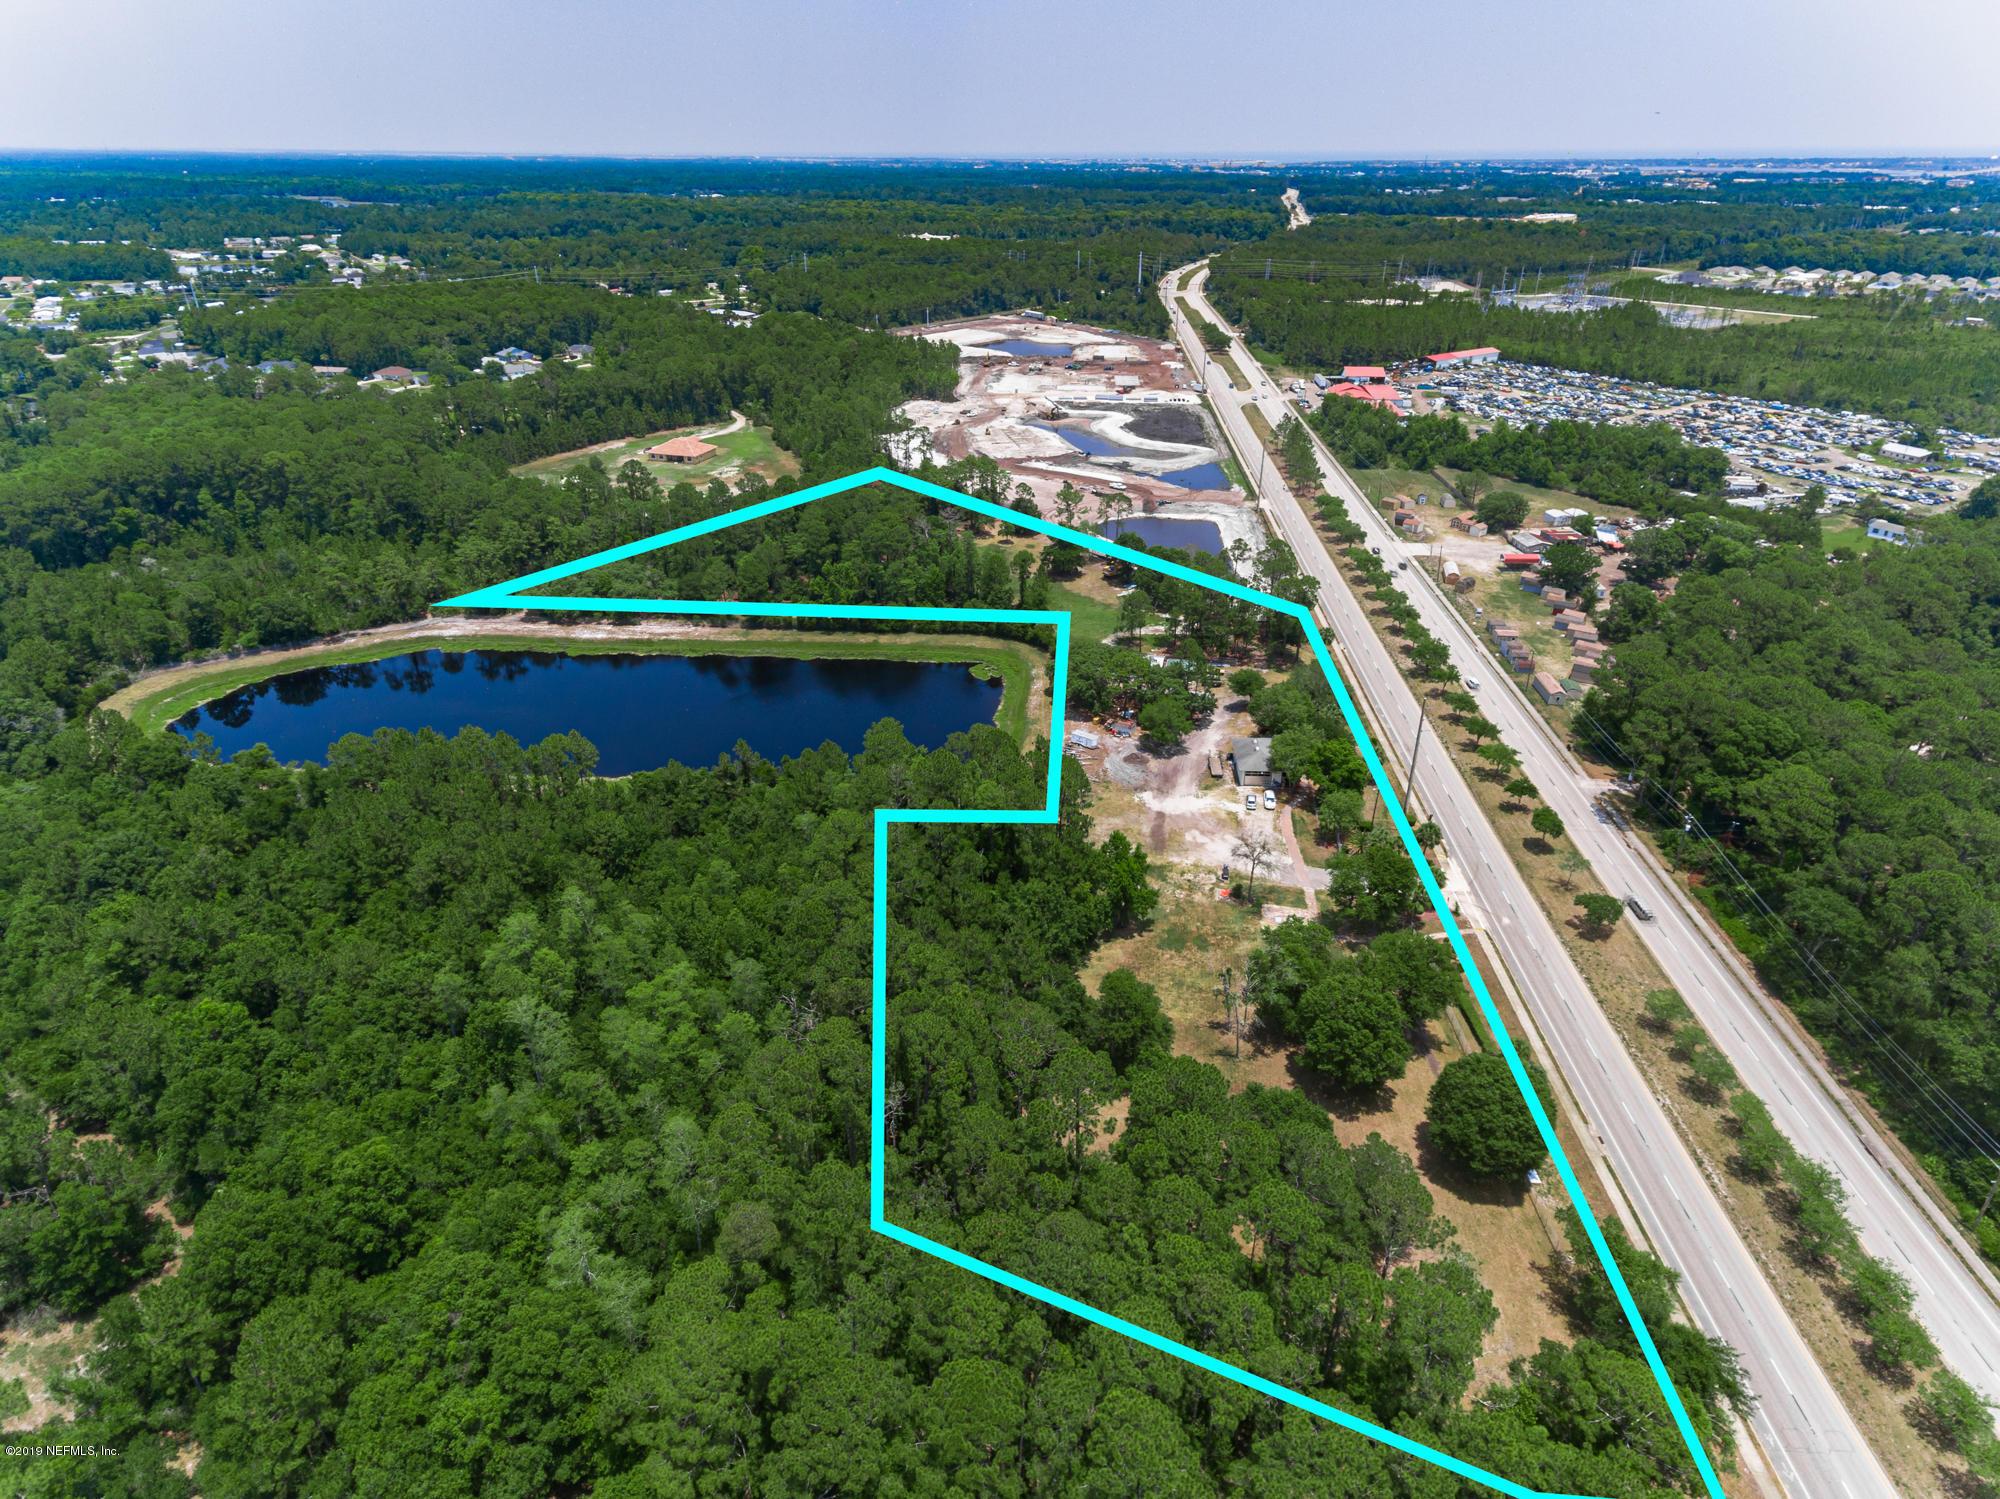 1401 State Rd 207, St. Augustine FL 32086 - Photo 2